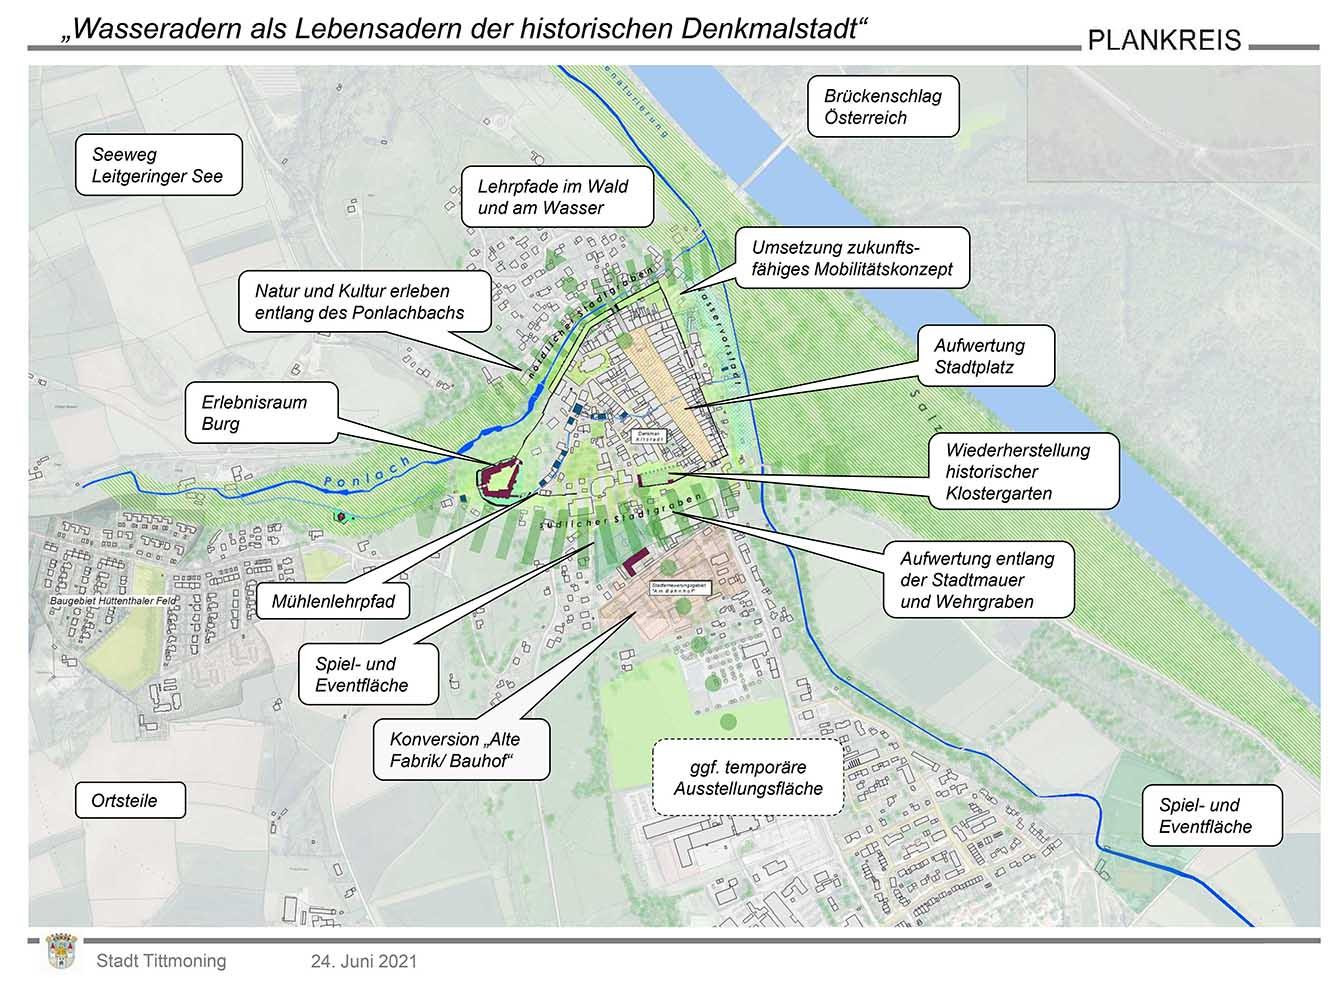 Landesgartenschau, Planskizze